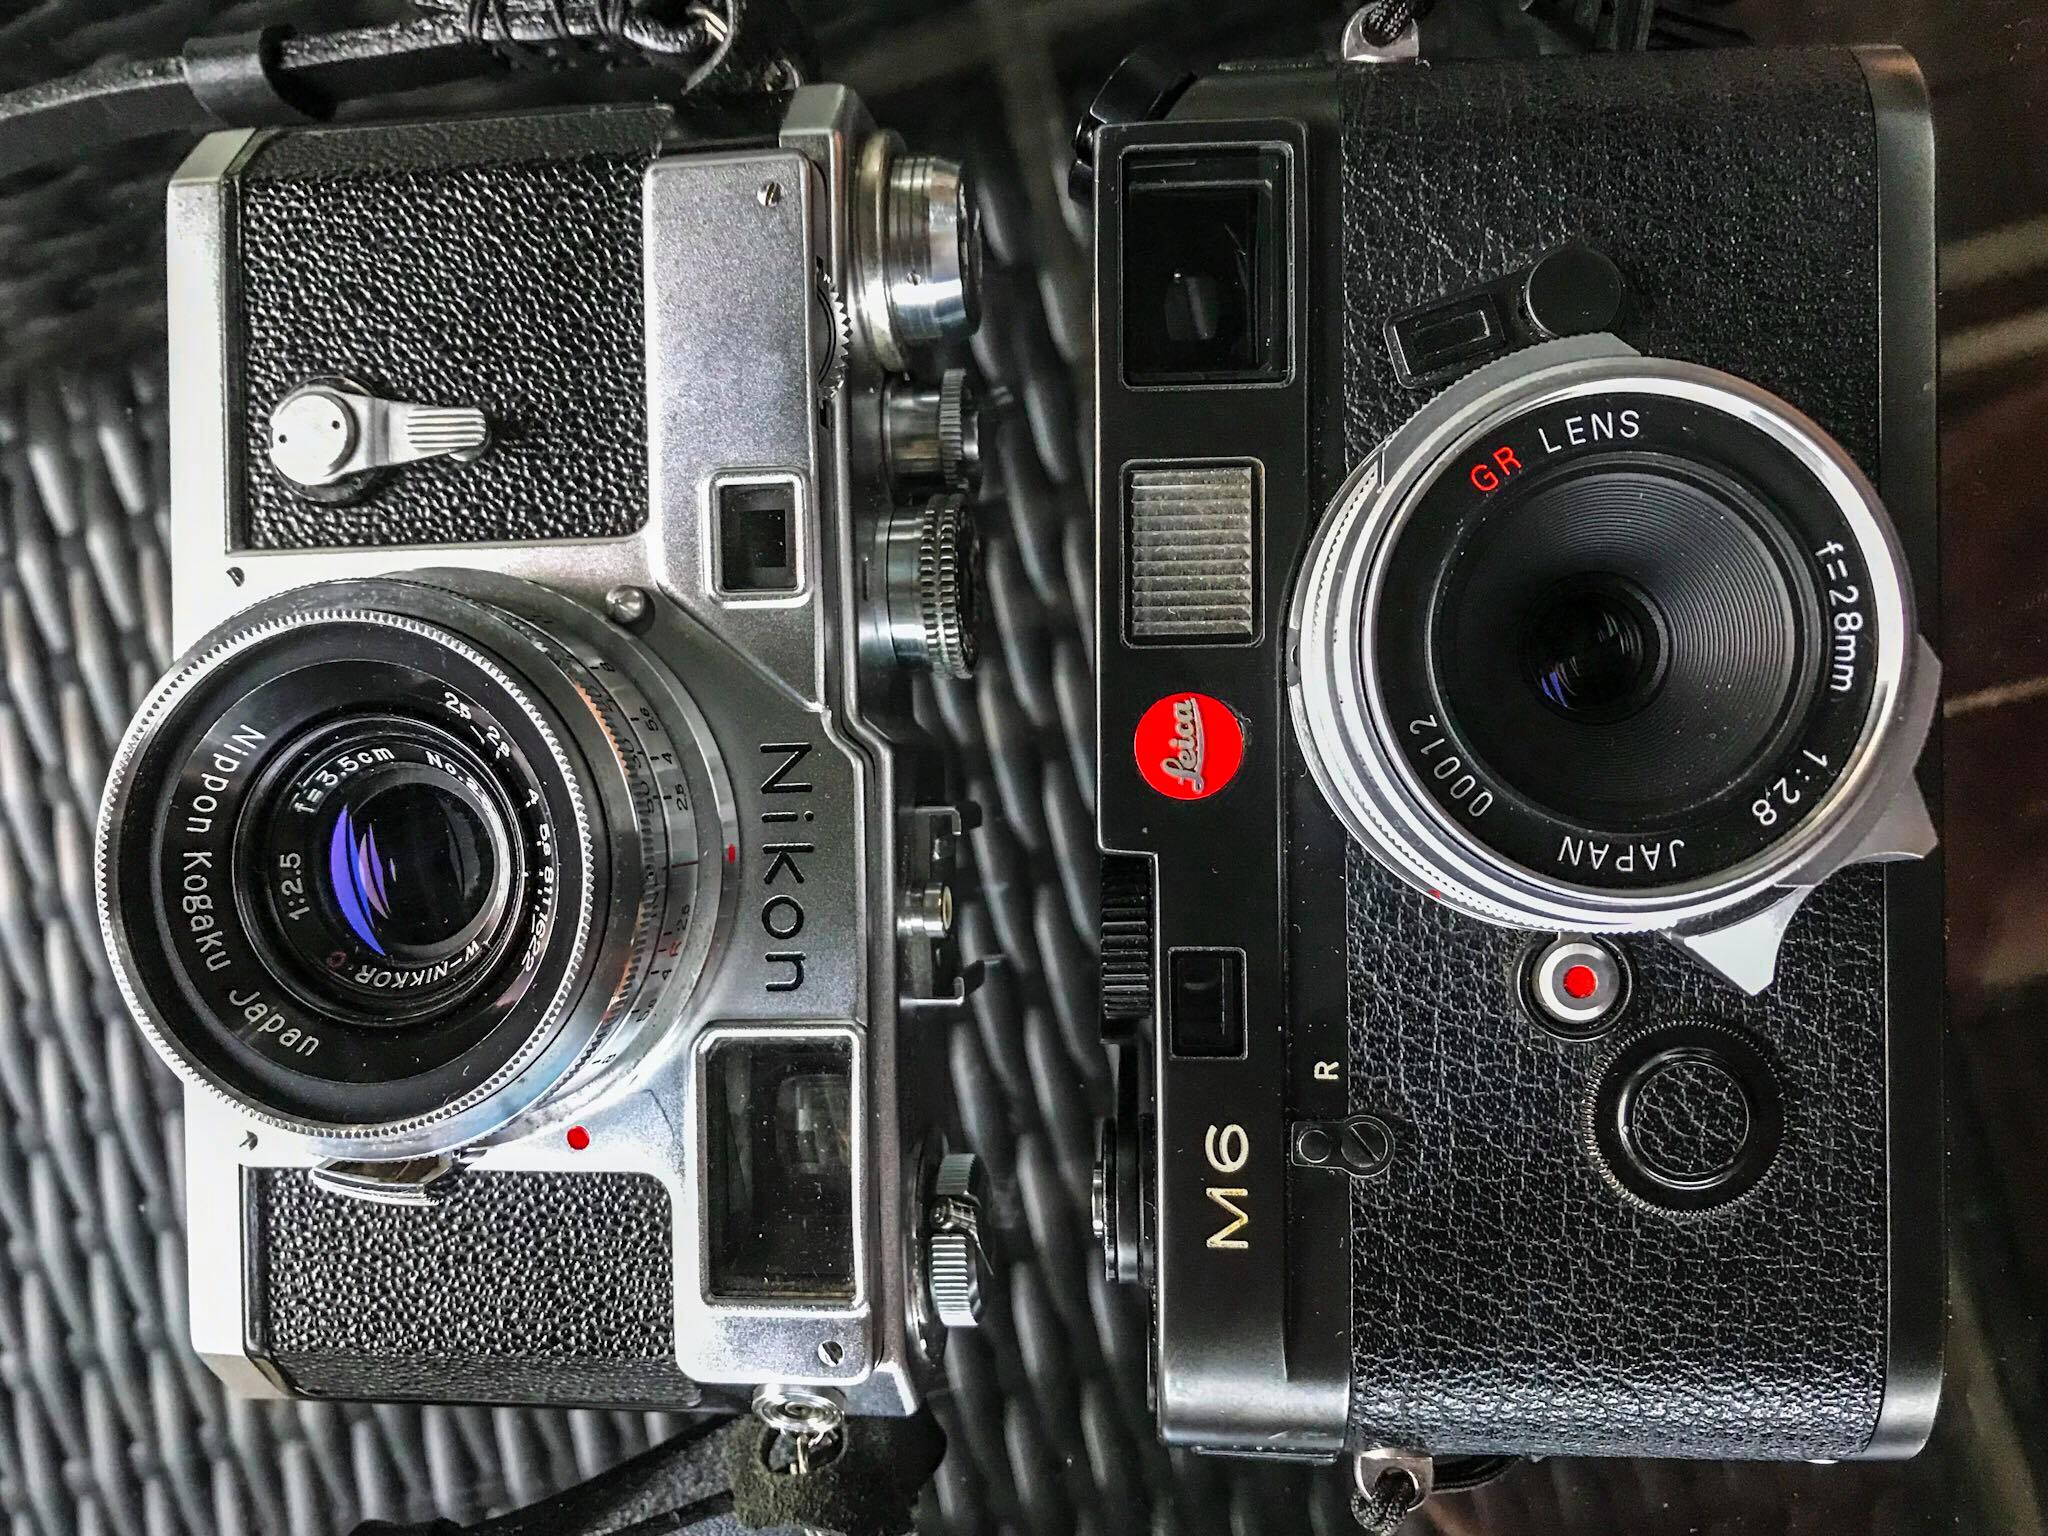 Nijon S3 next to the equally impressive Leica M6